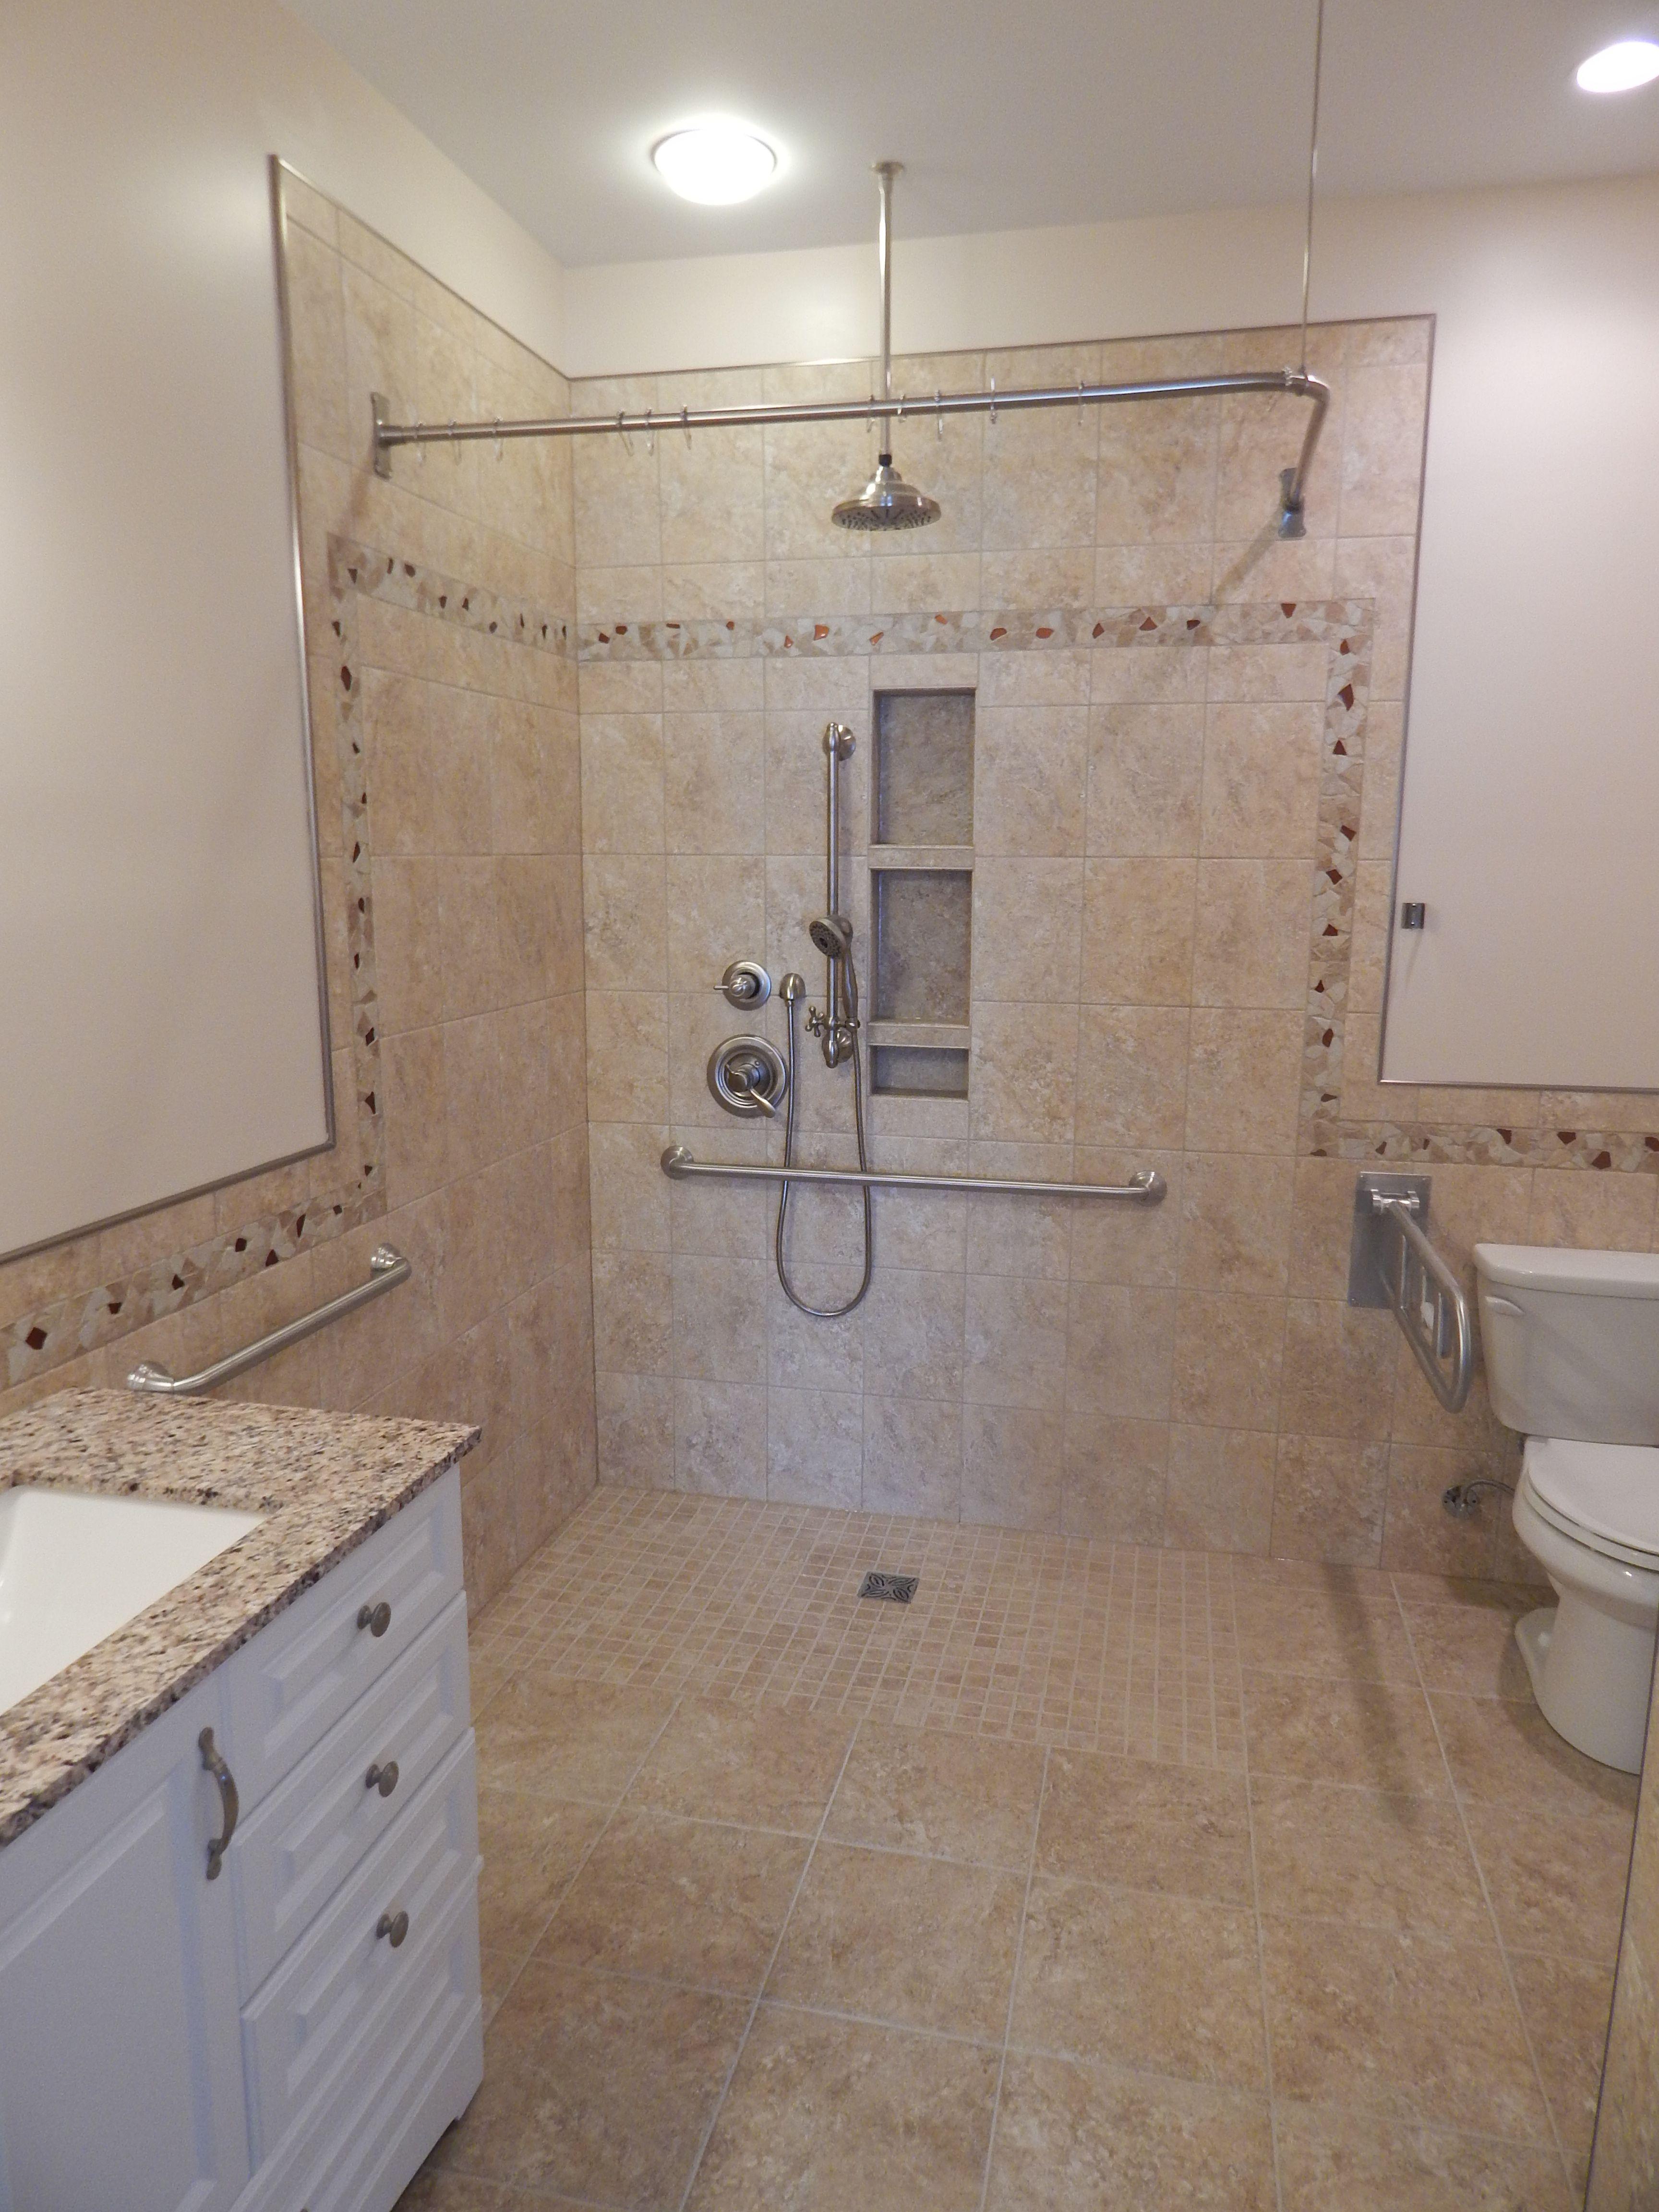 Custom barrier free bathroom with fold down grab bars